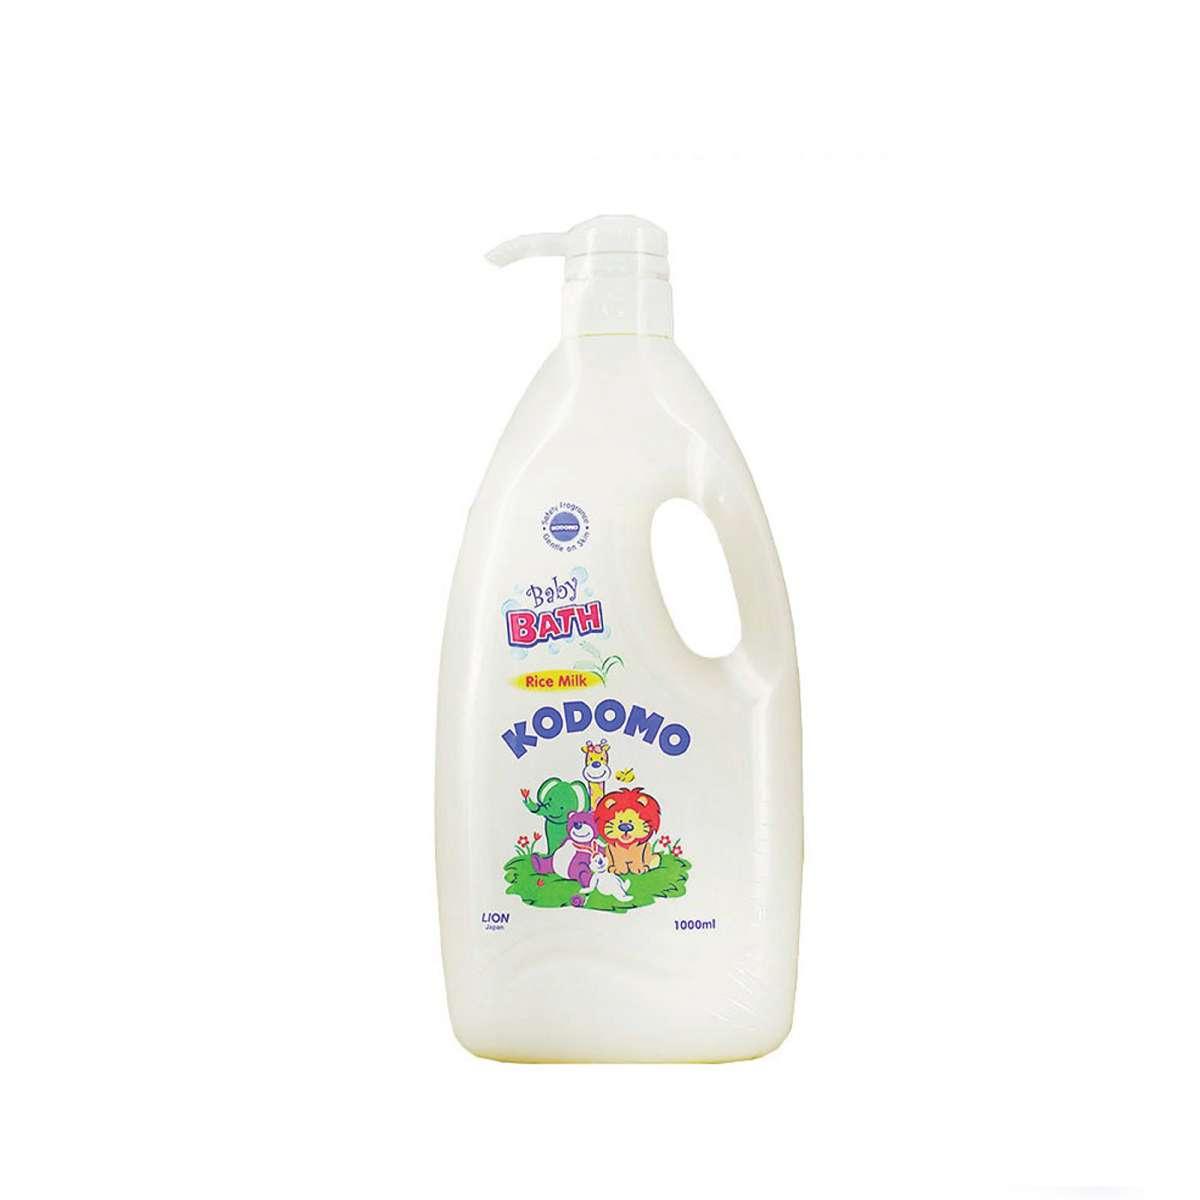 KODOMO Baby Bath Rice Milk 1000 ML